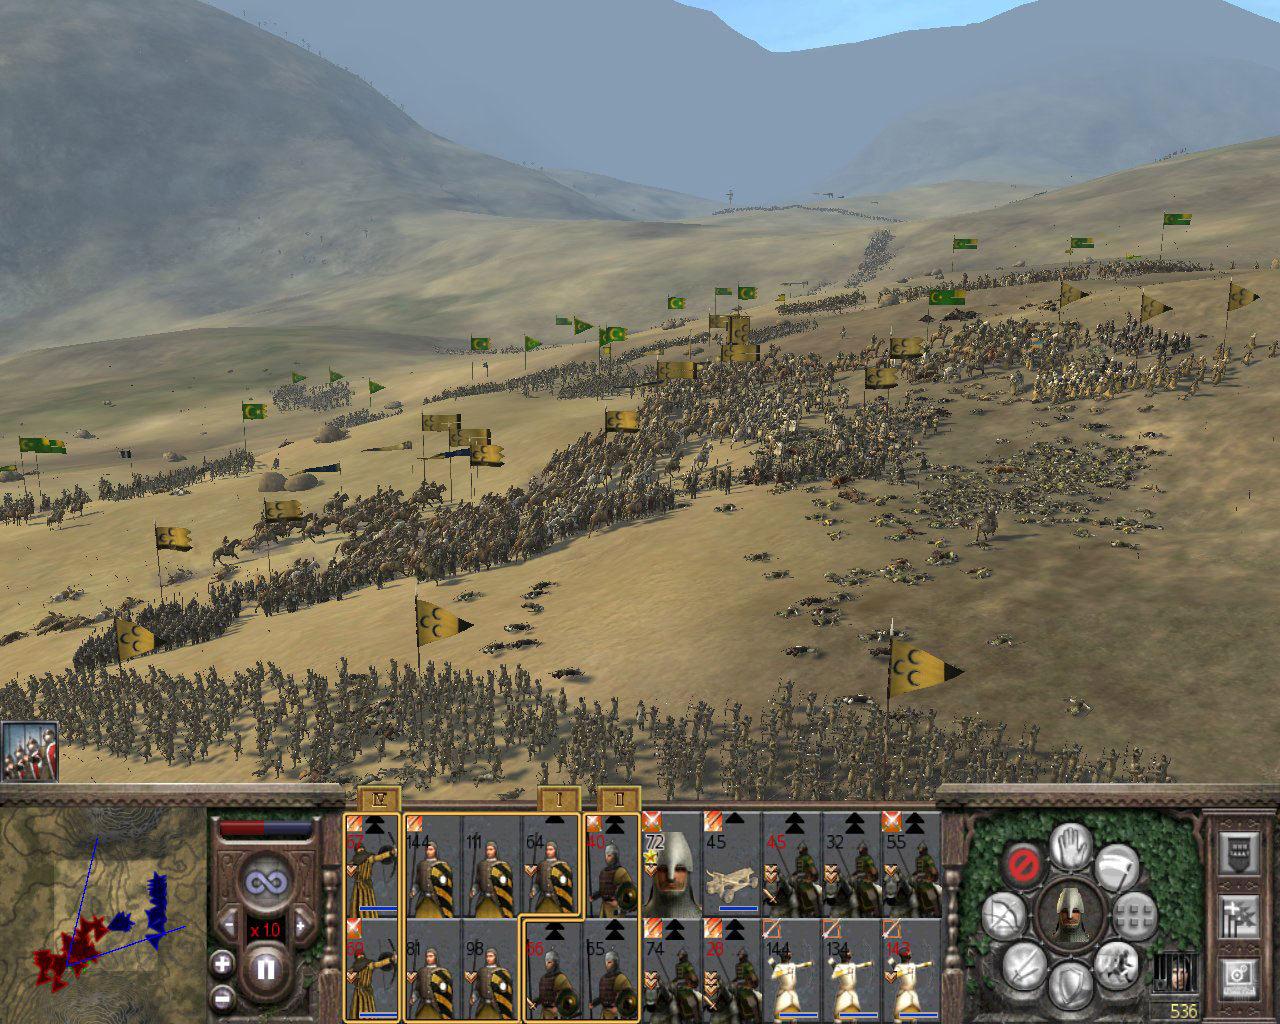 Medieval 2 total war online game online casino american express deposit